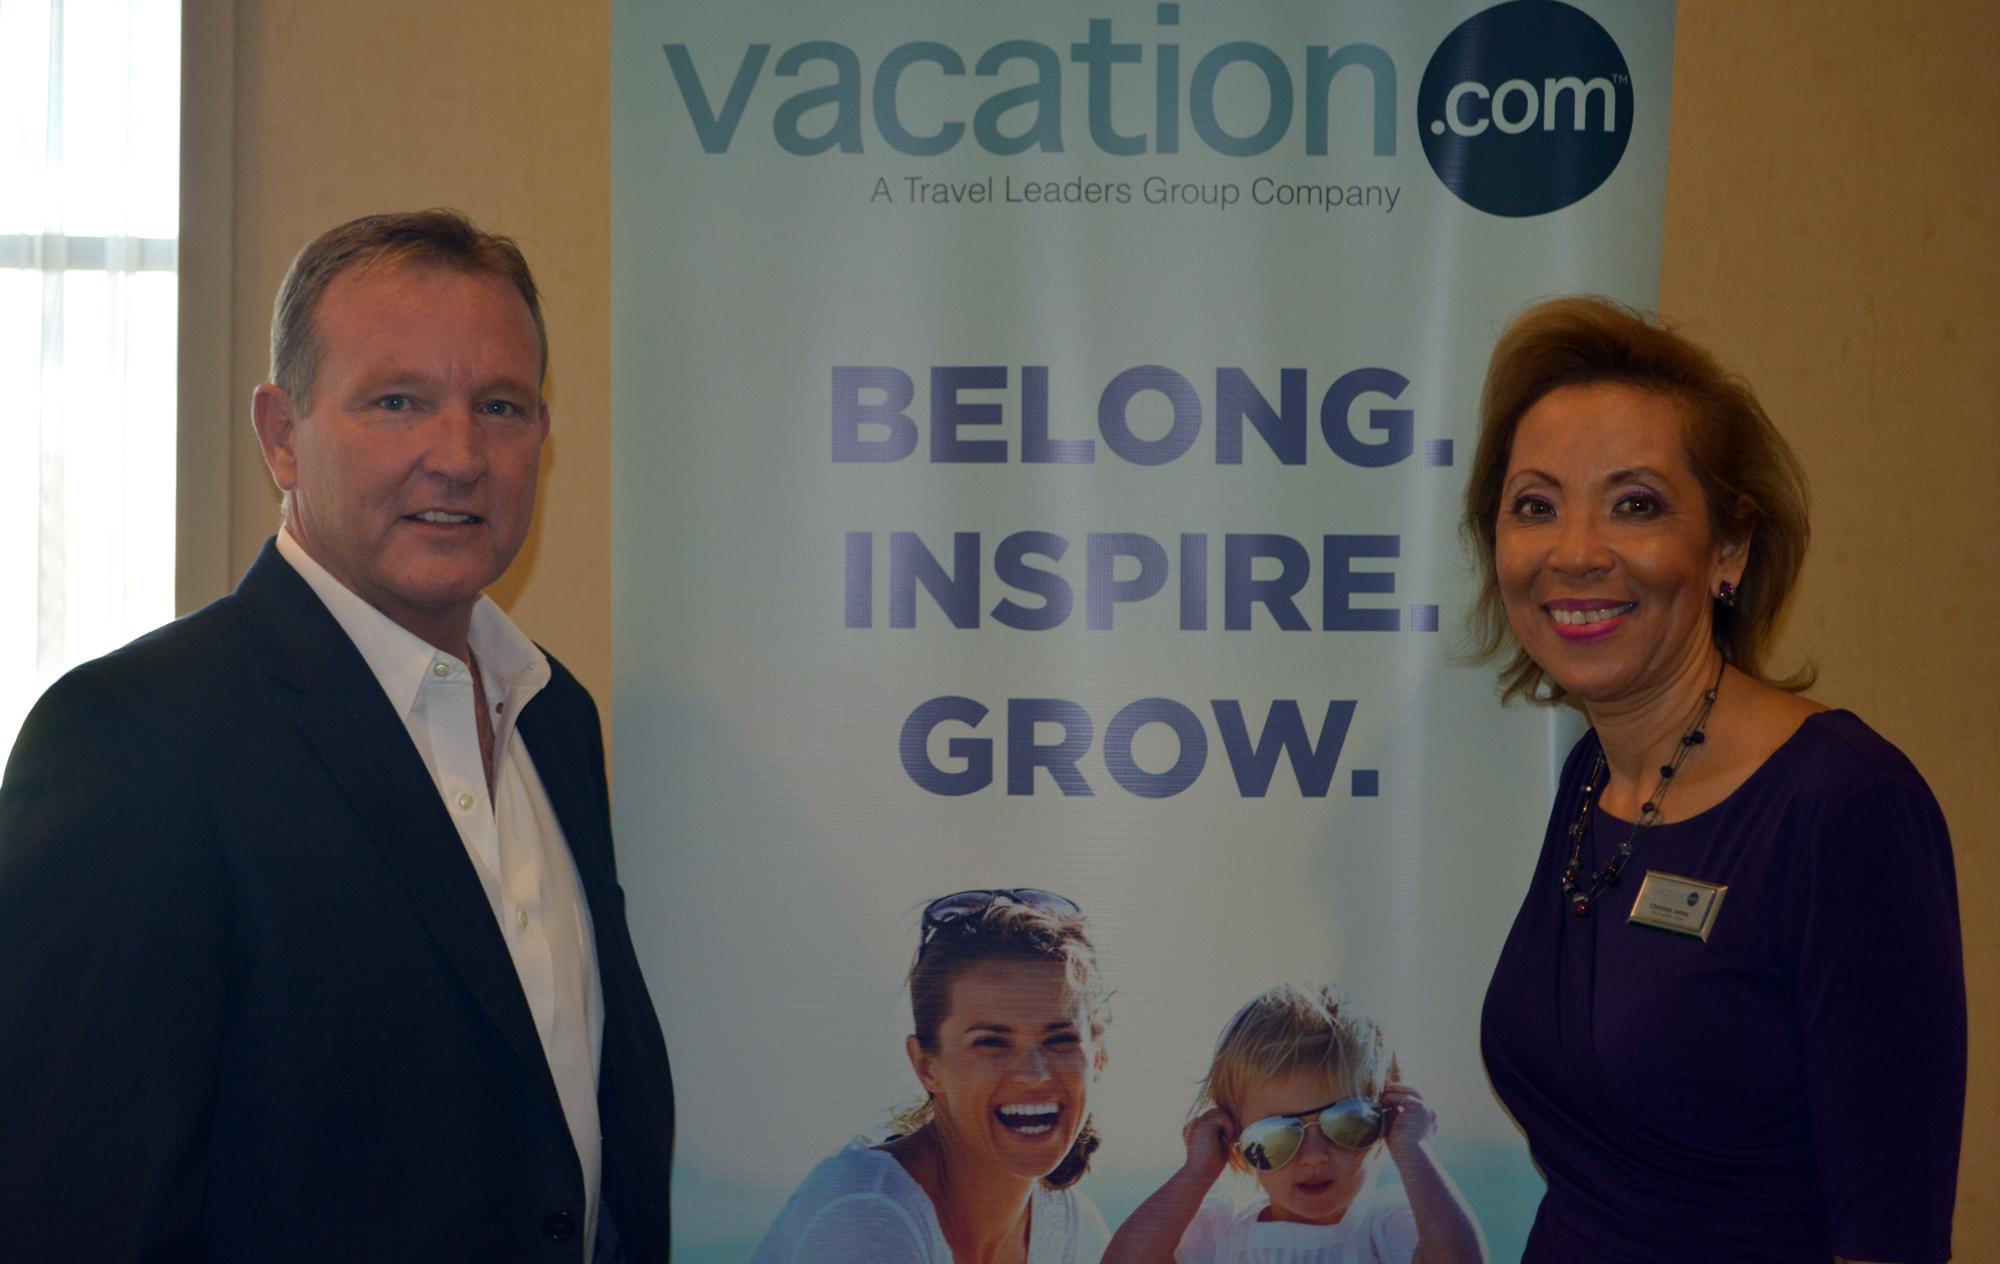 Vacation.com's regional conferences underway